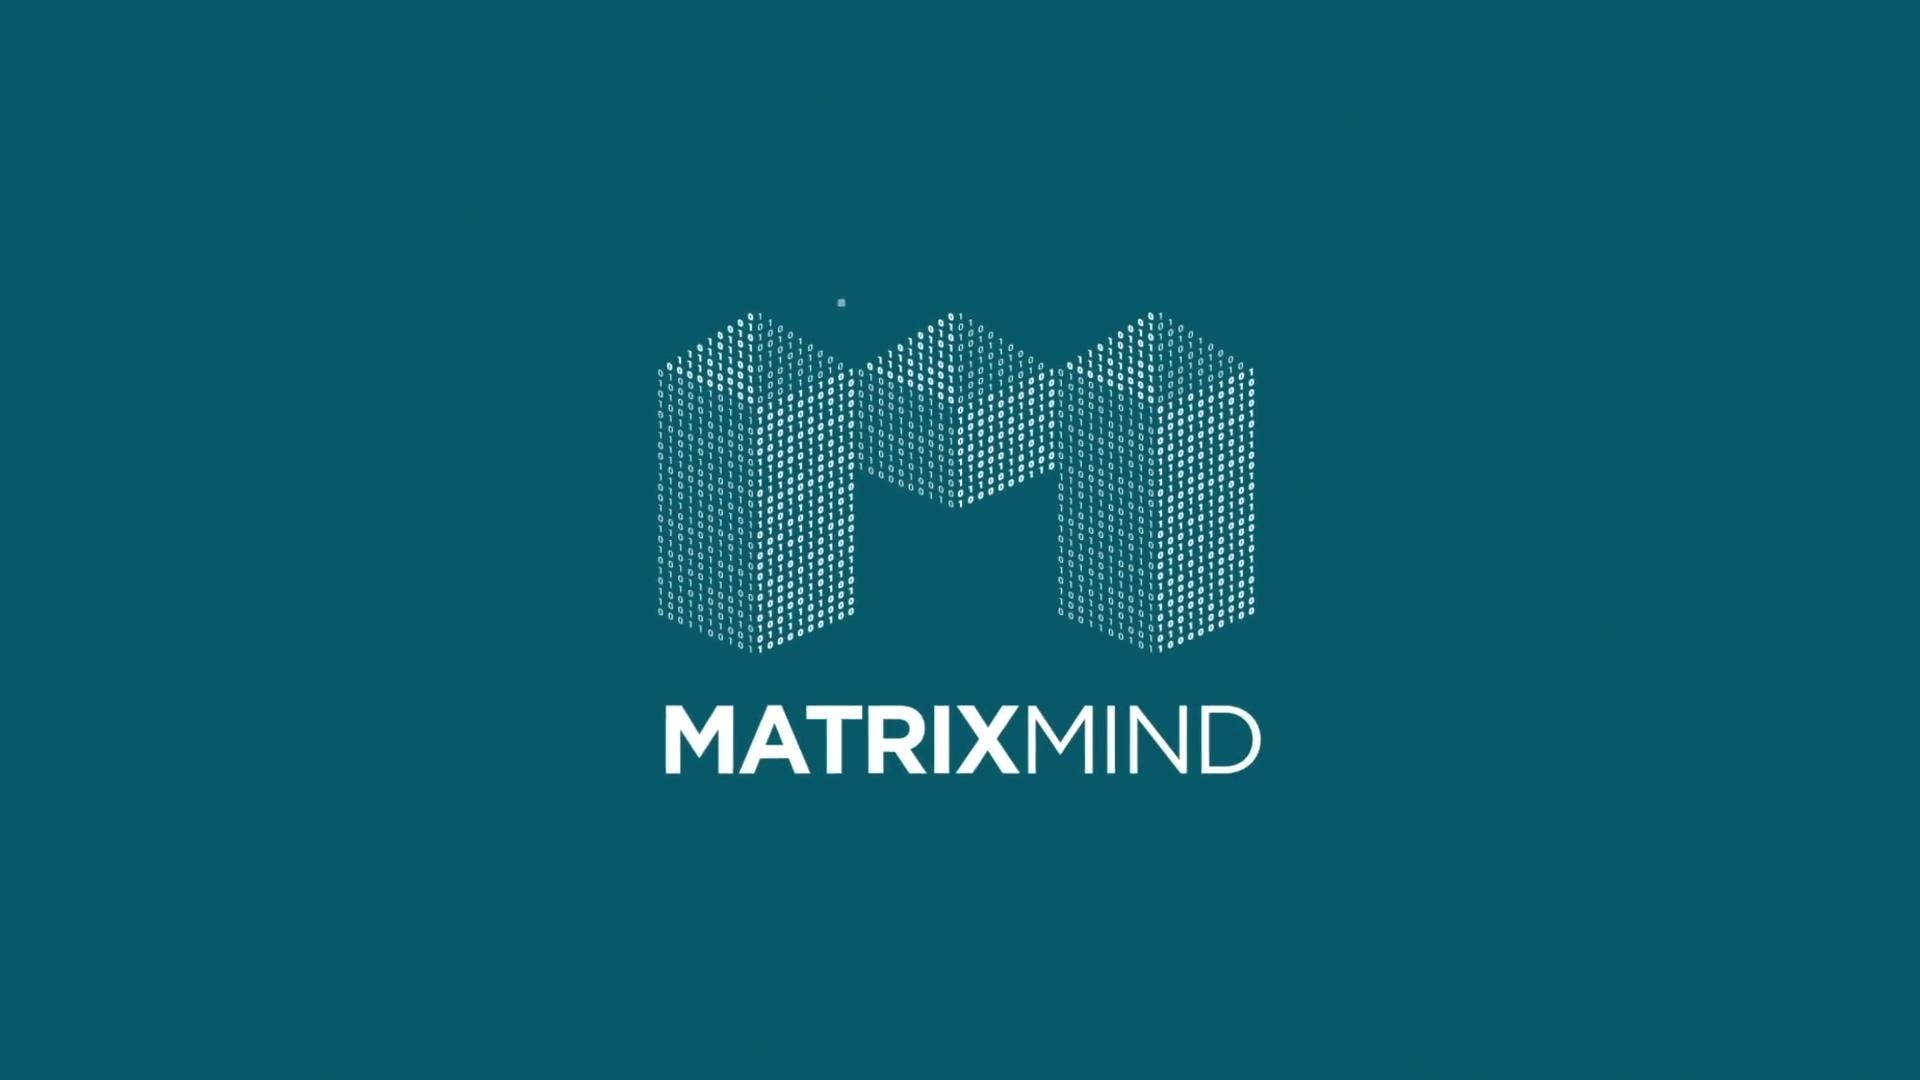 Matrxmind Multicloud deel 1